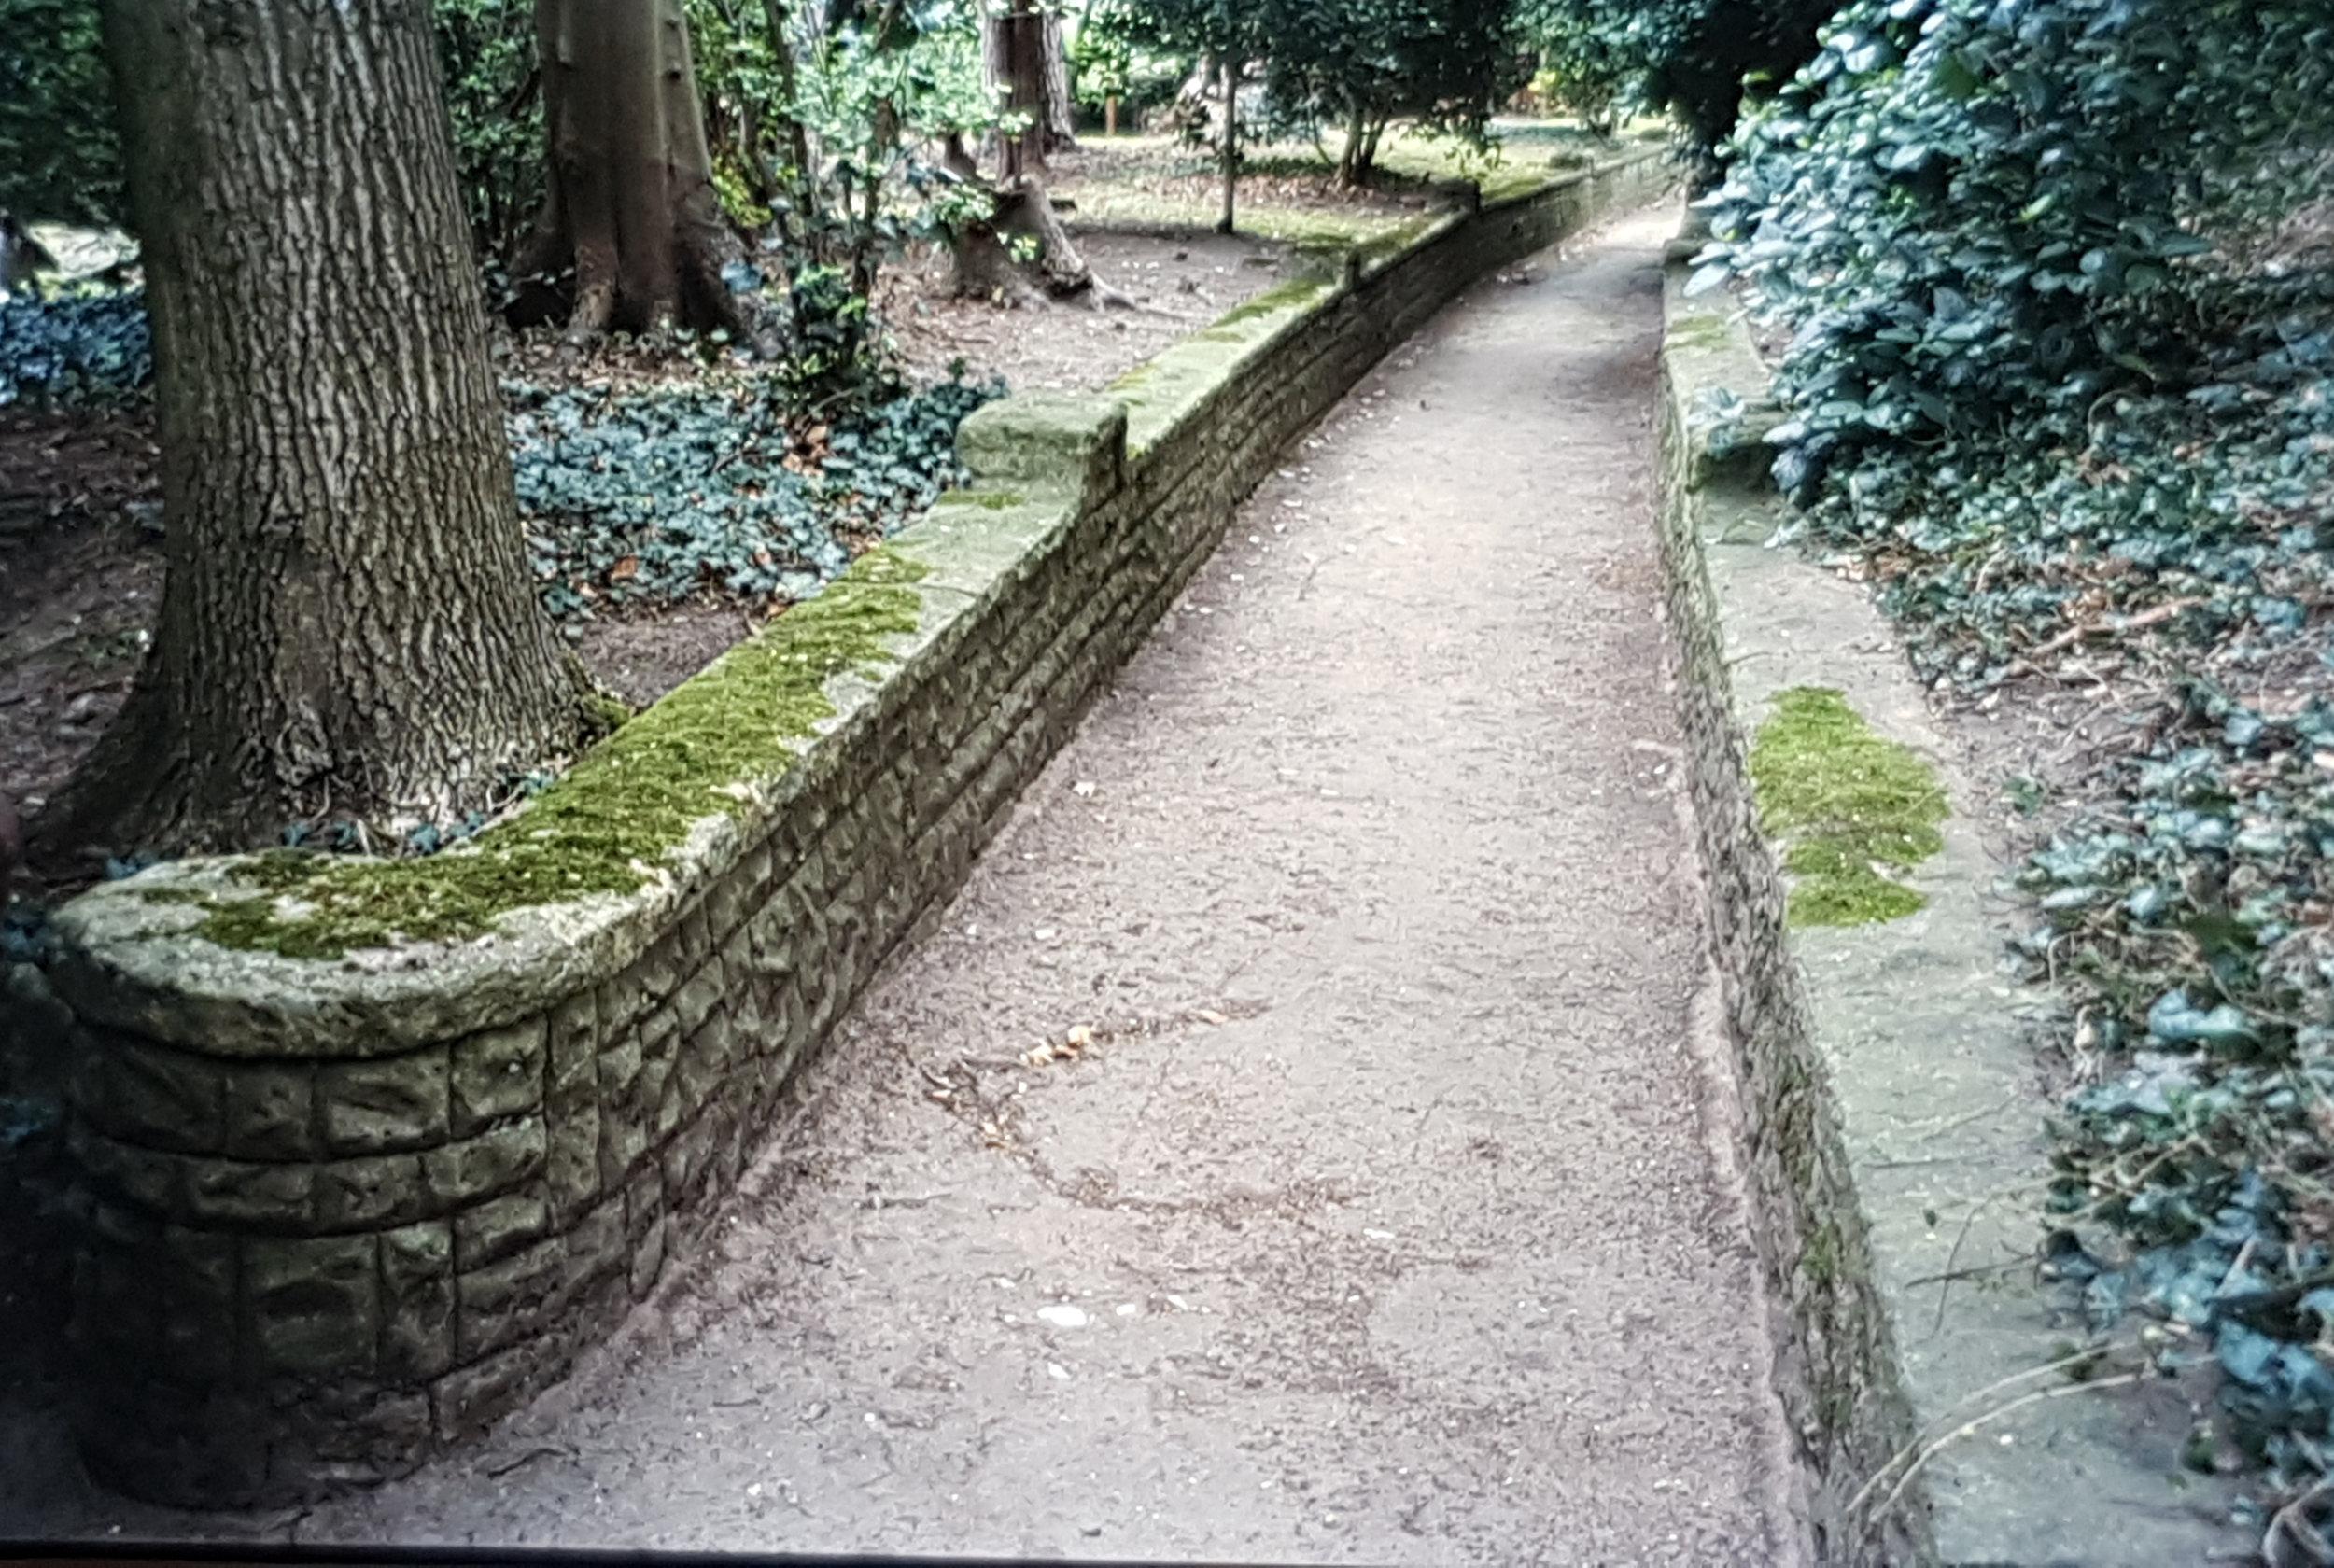 Pathway at Merrow Grange in 2002